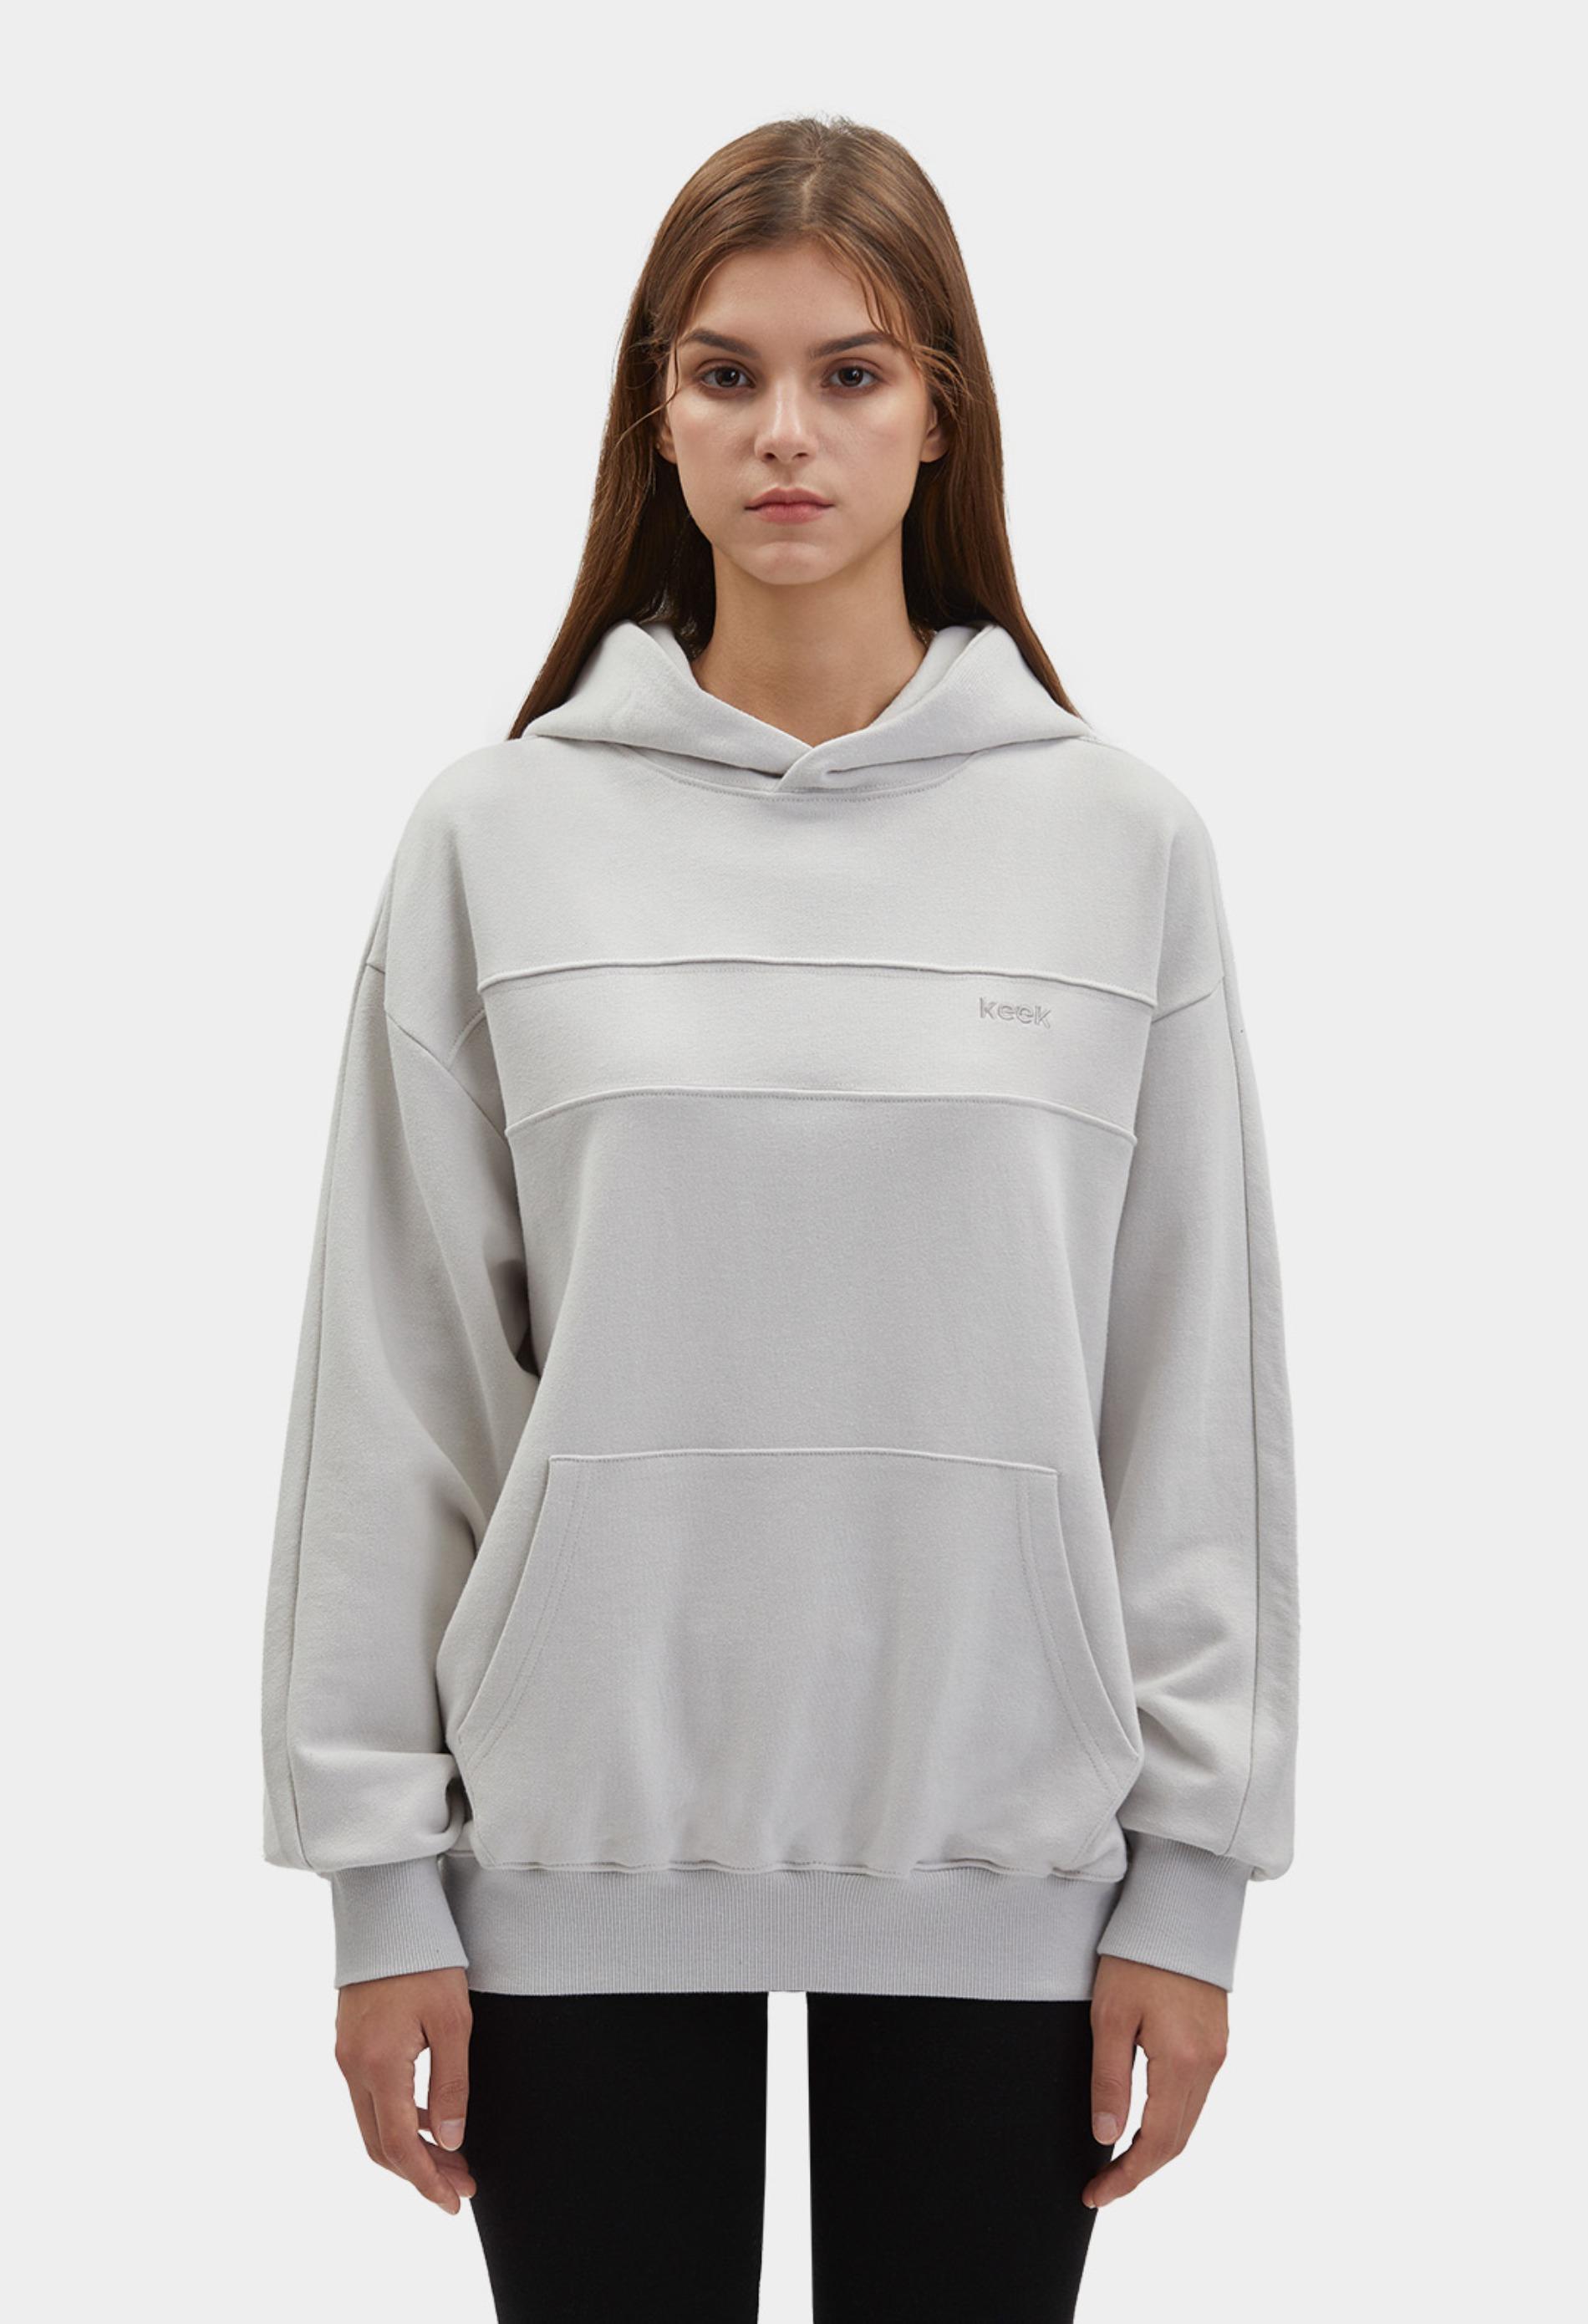 keek [Unisex] Block Hoodie - Light Gray 스트릿패션 유니섹스브랜드 커플시밀러룩 남자쇼핑몰 여성의류쇼핑몰 후드티 힙색